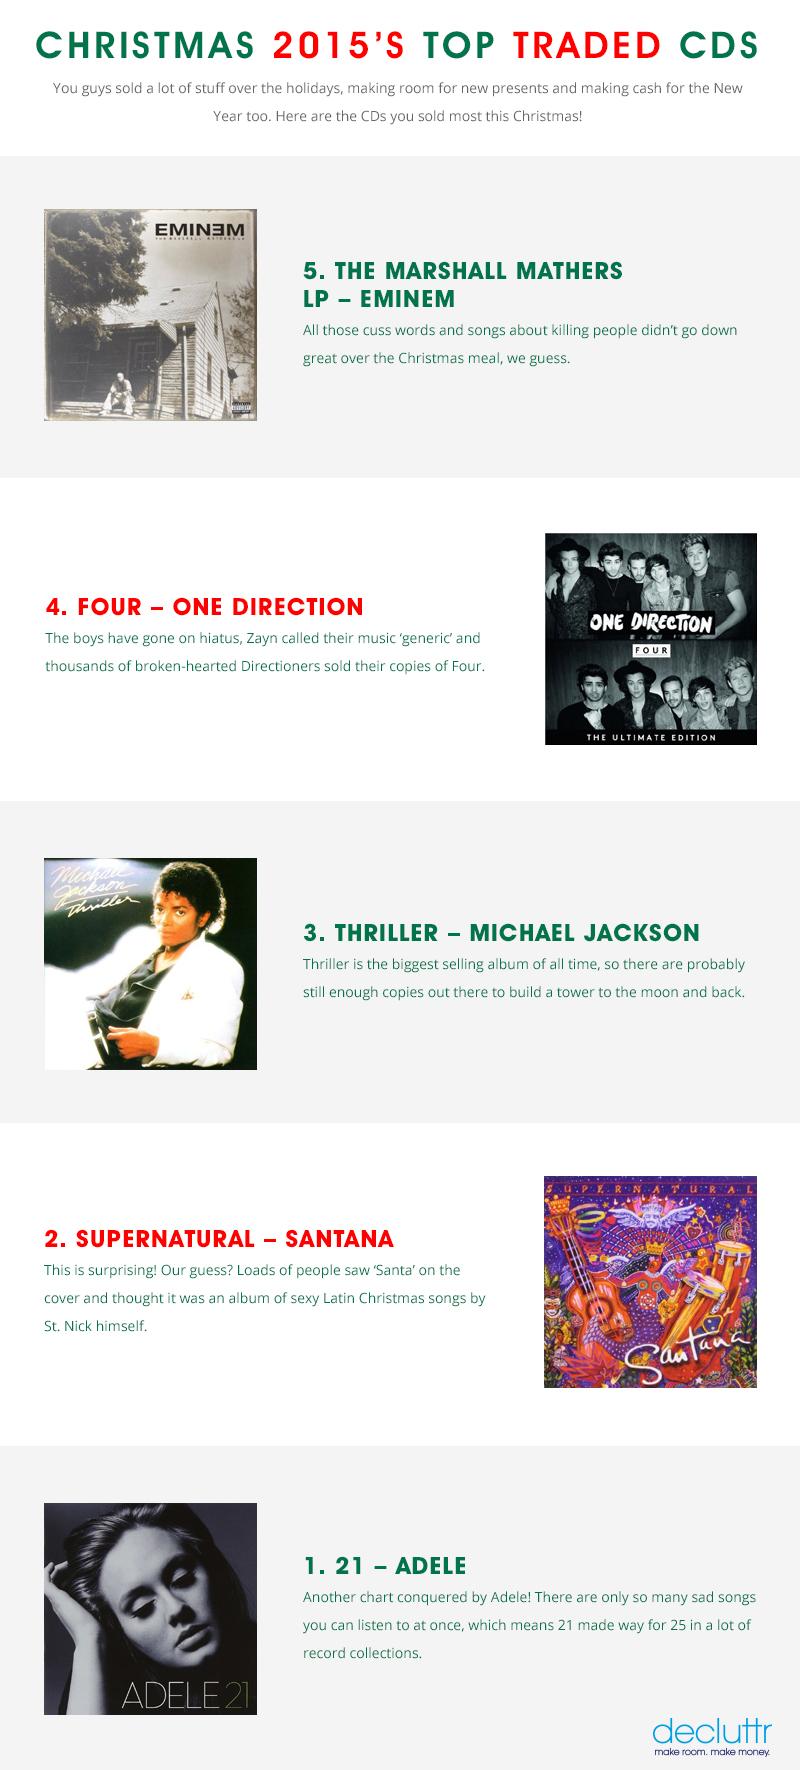 Christmas 2015 Top Traded CD